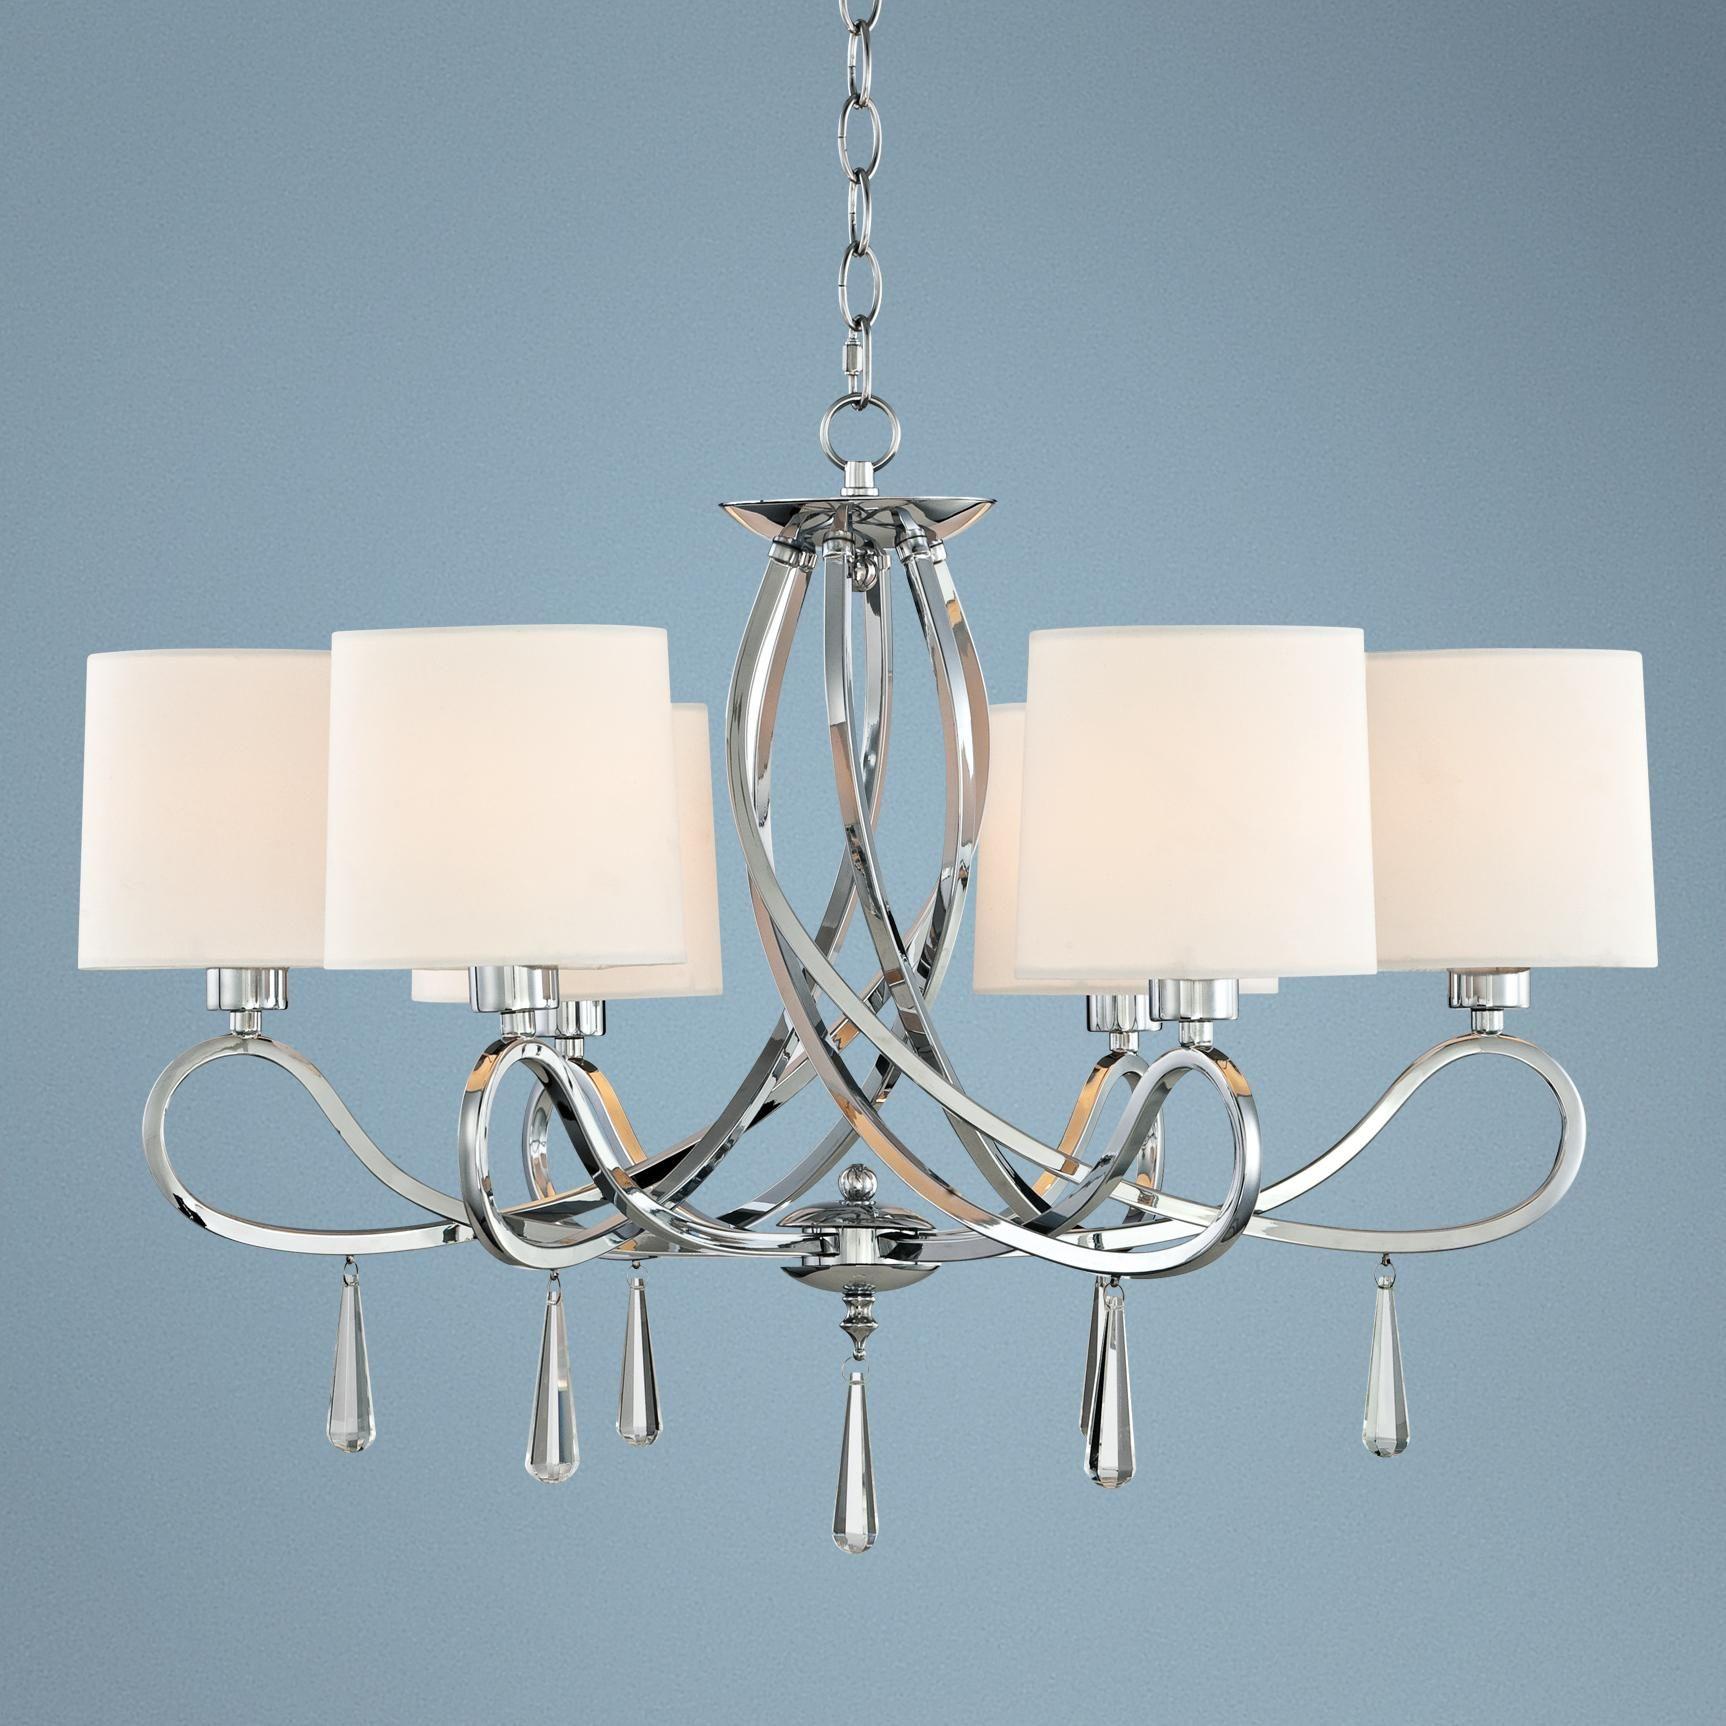 "Casual Dining Room Lighting Fixtures: Chrome Swirl Glass Drop 26"" Wide Chandelier"